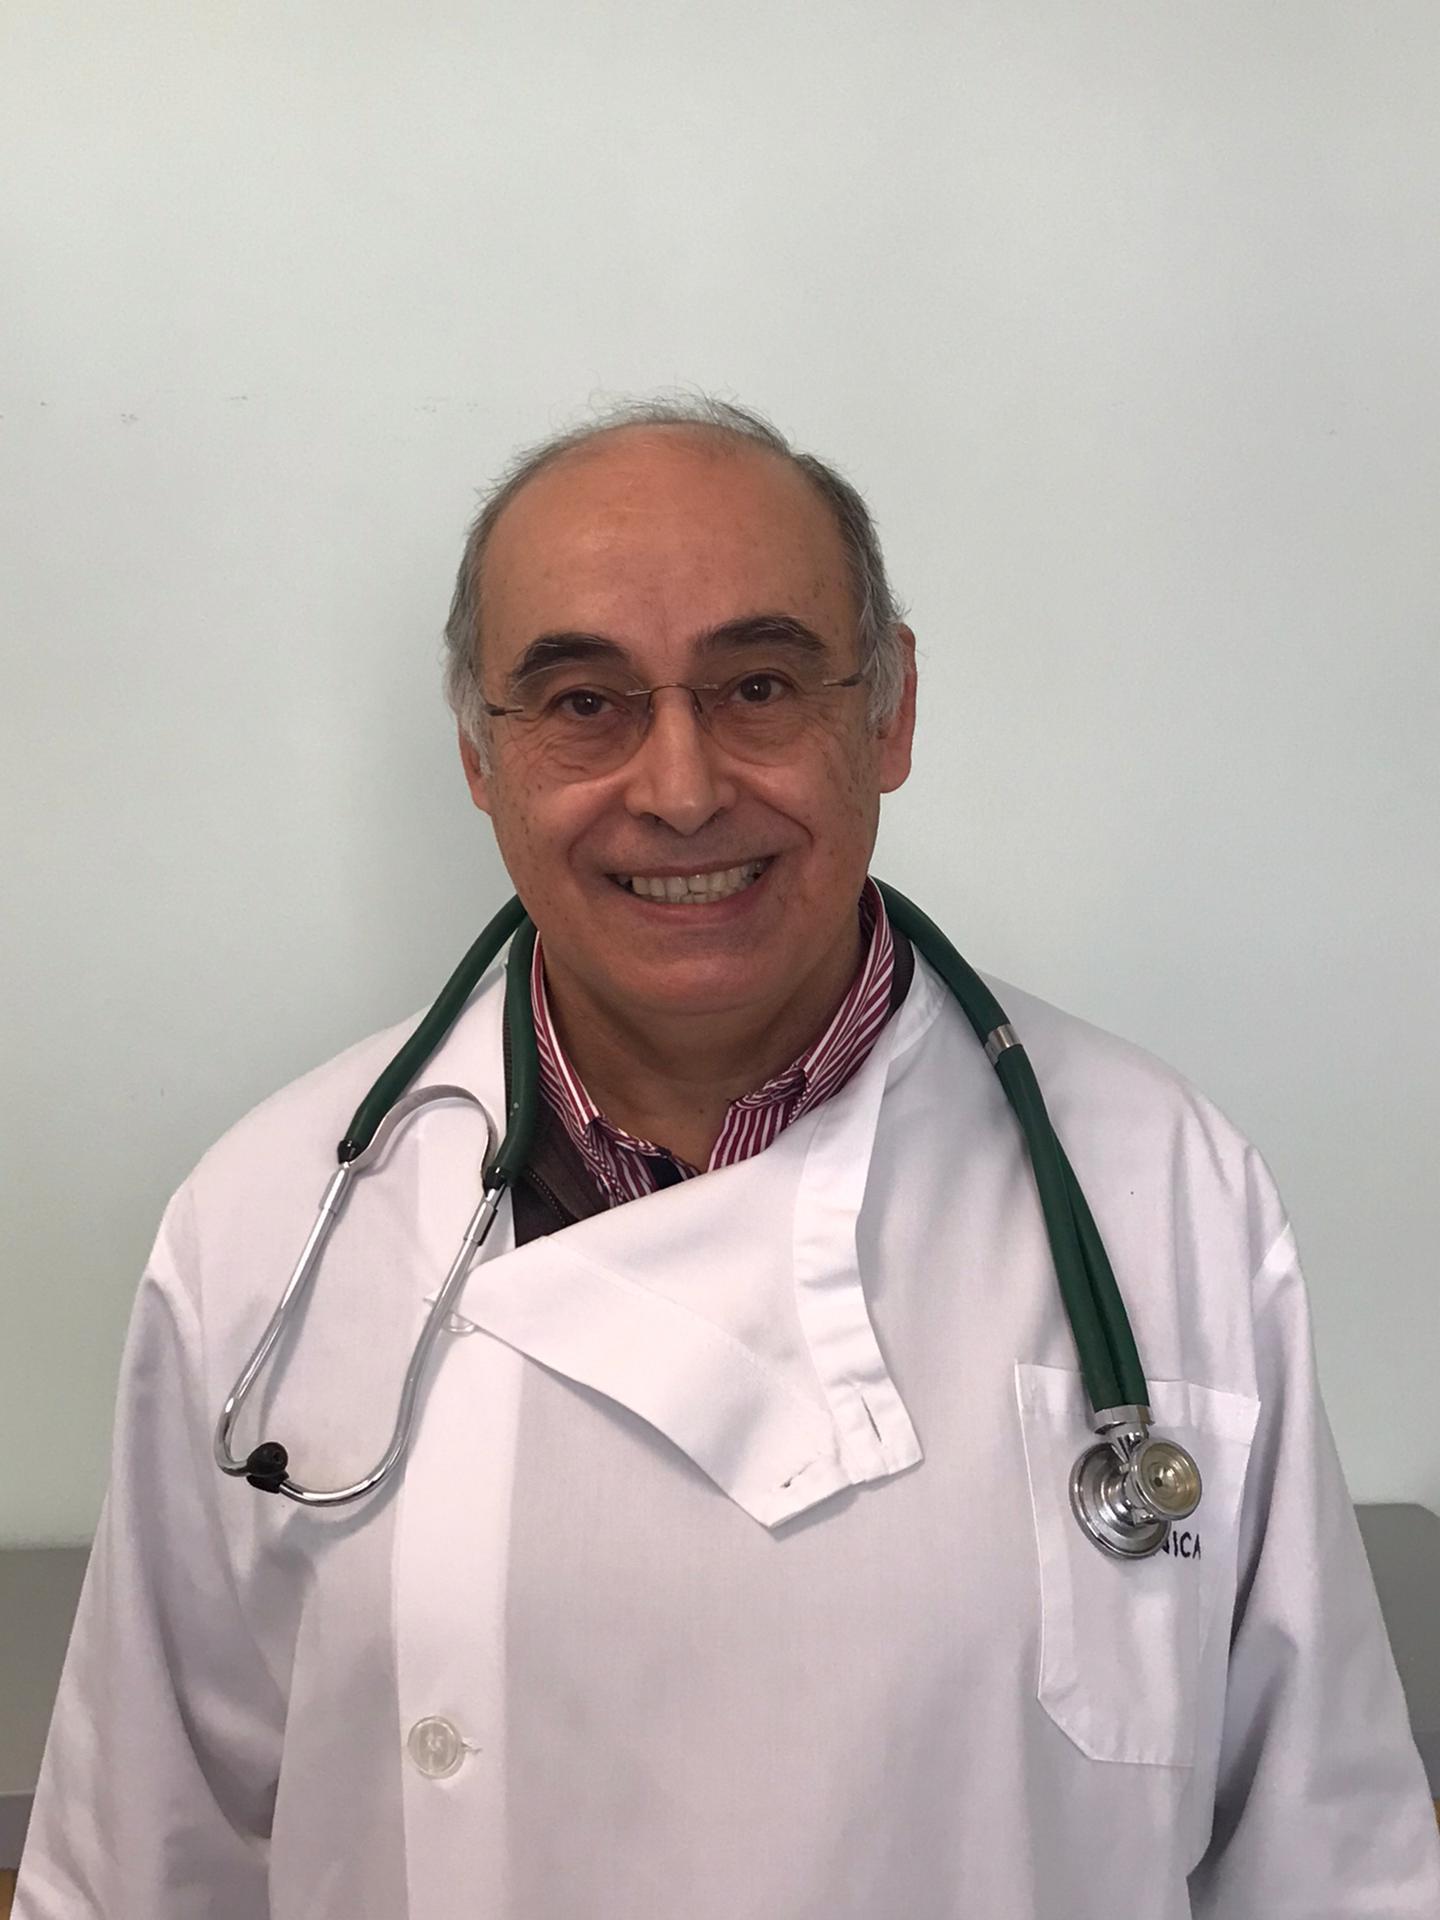 DR VITOR SANTOS